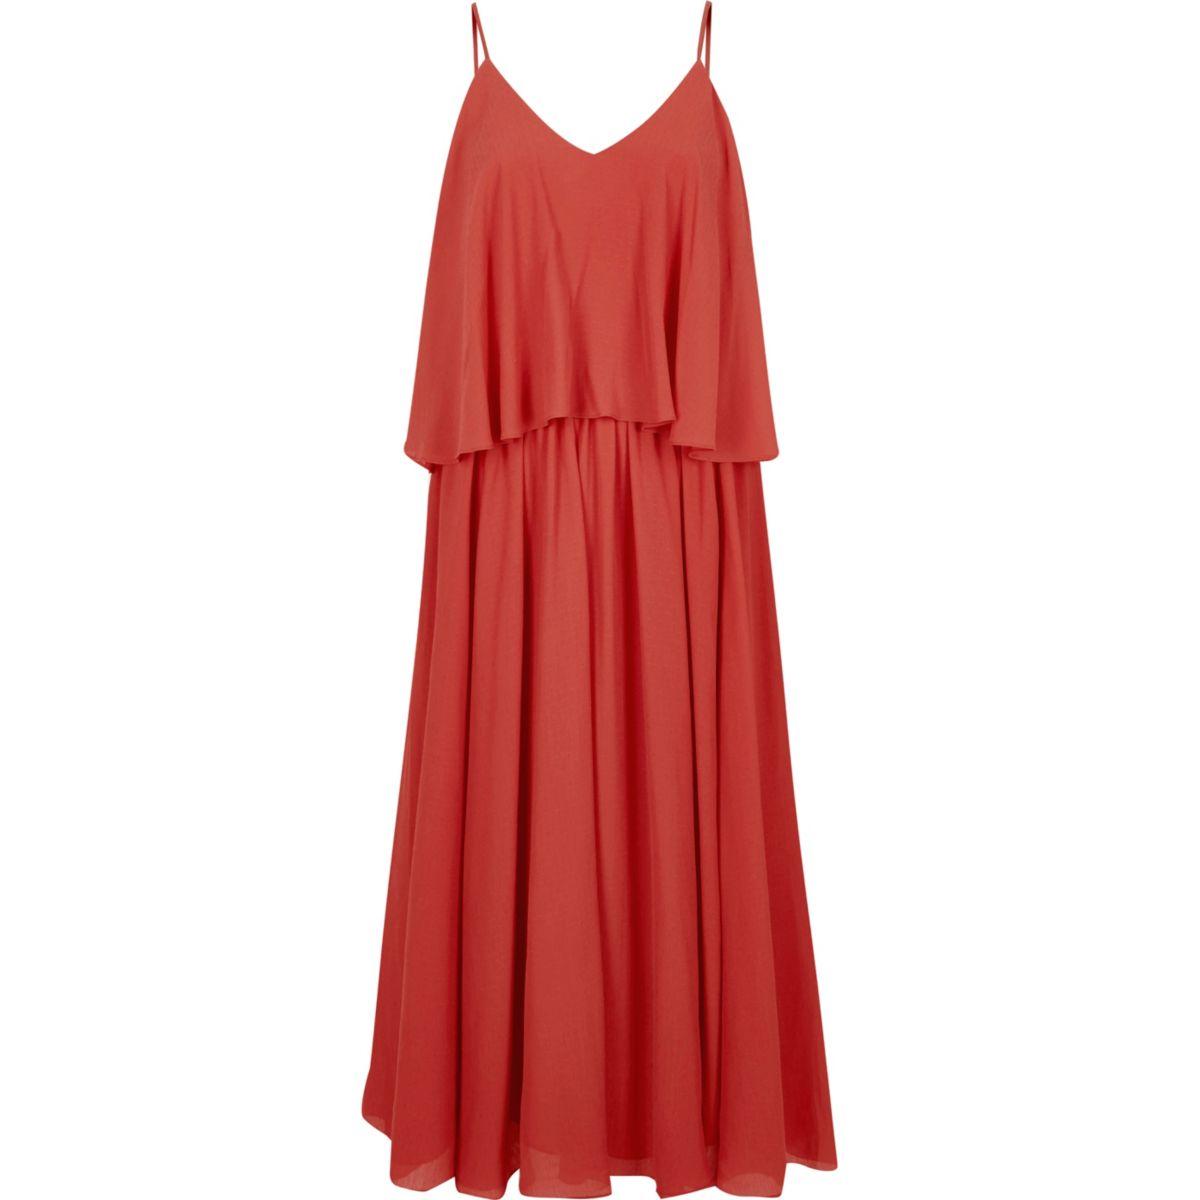 Dark orange layer cami dress